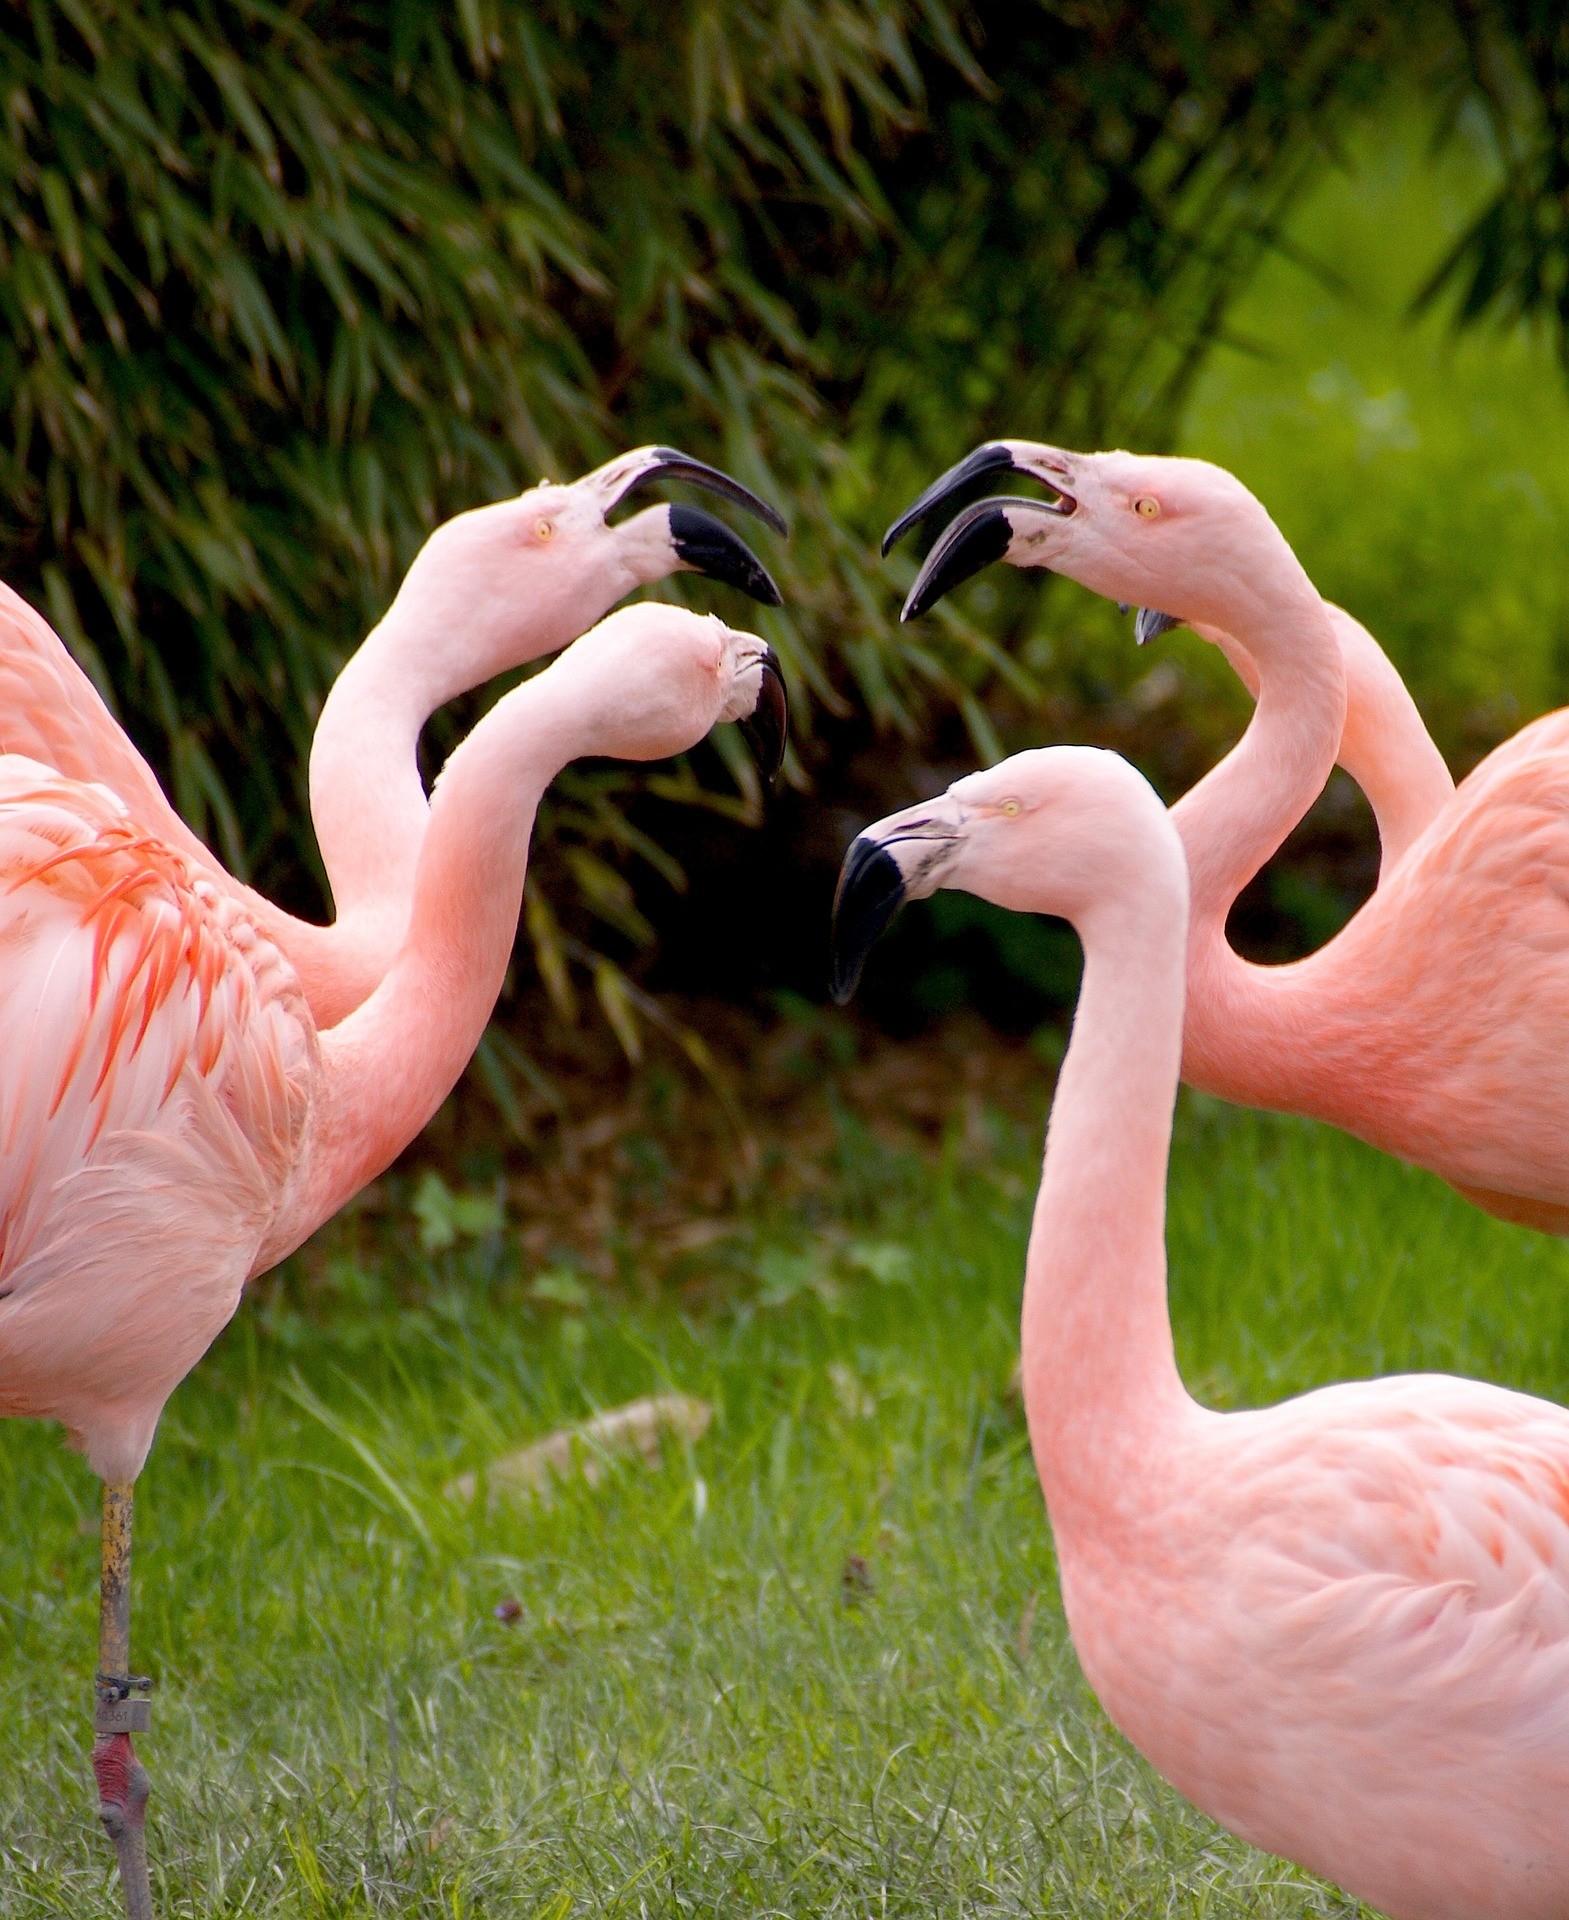 15791859754606939_by_hans3595_flamingos-1335042_1920